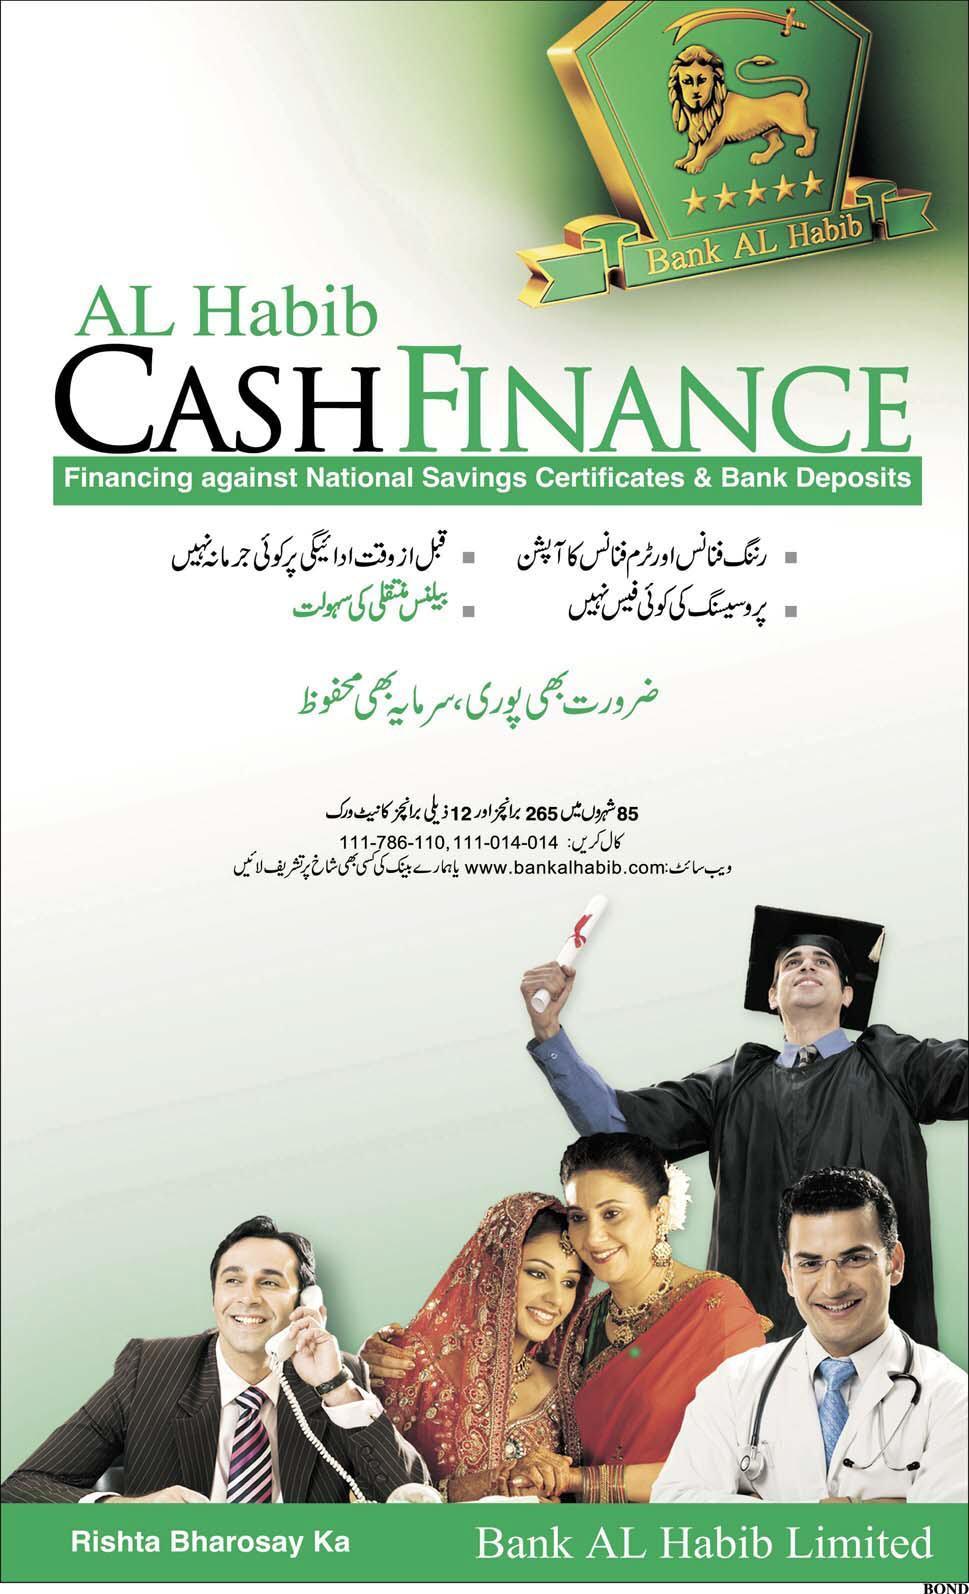 bank al habib internet banking